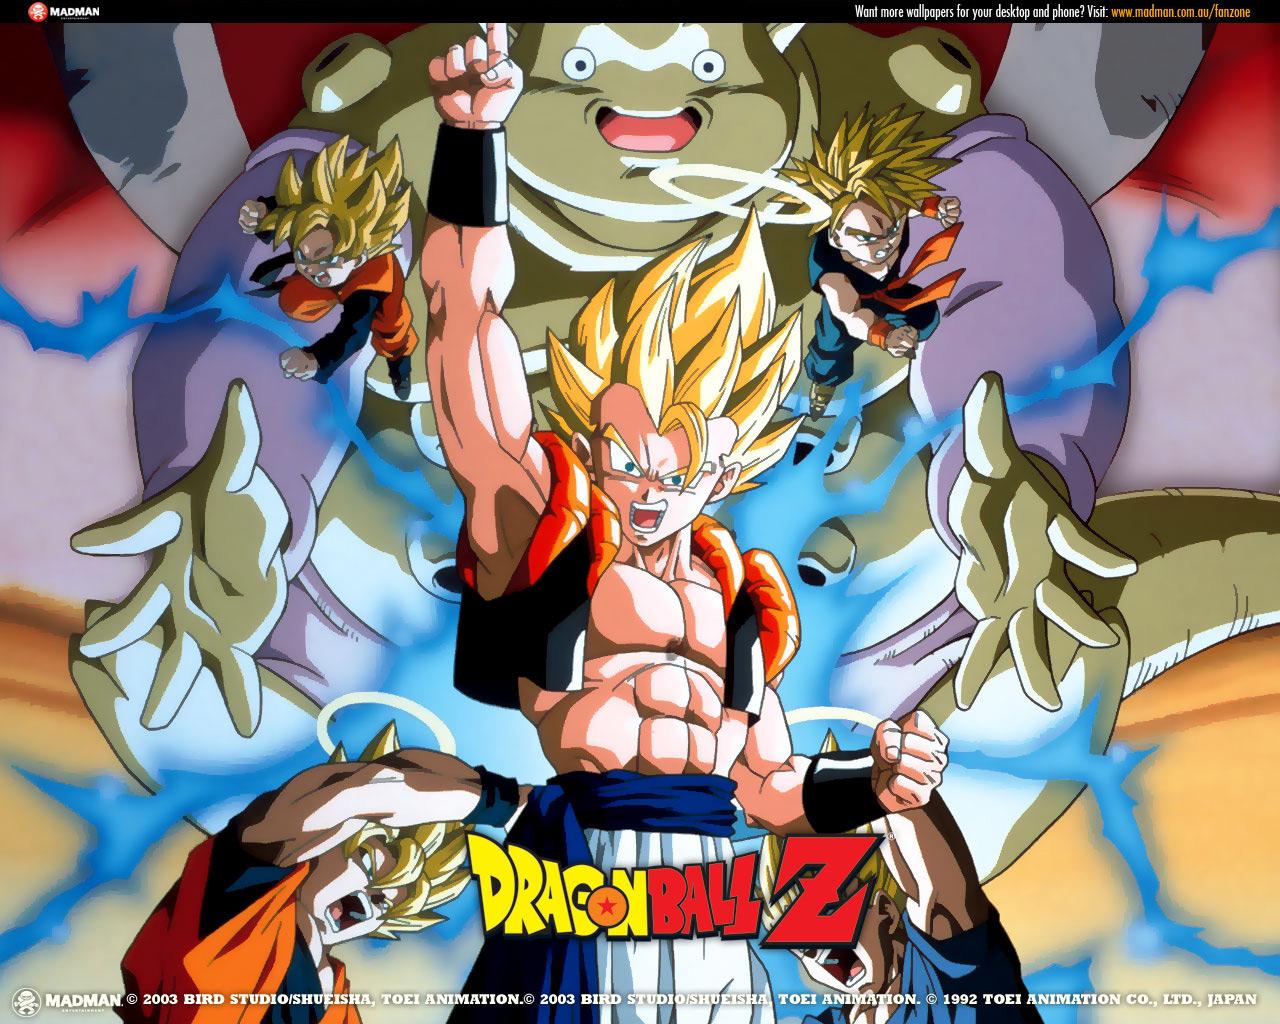 goku in dragon ball z goku in dragon ball z wallpaper download 1280x1024